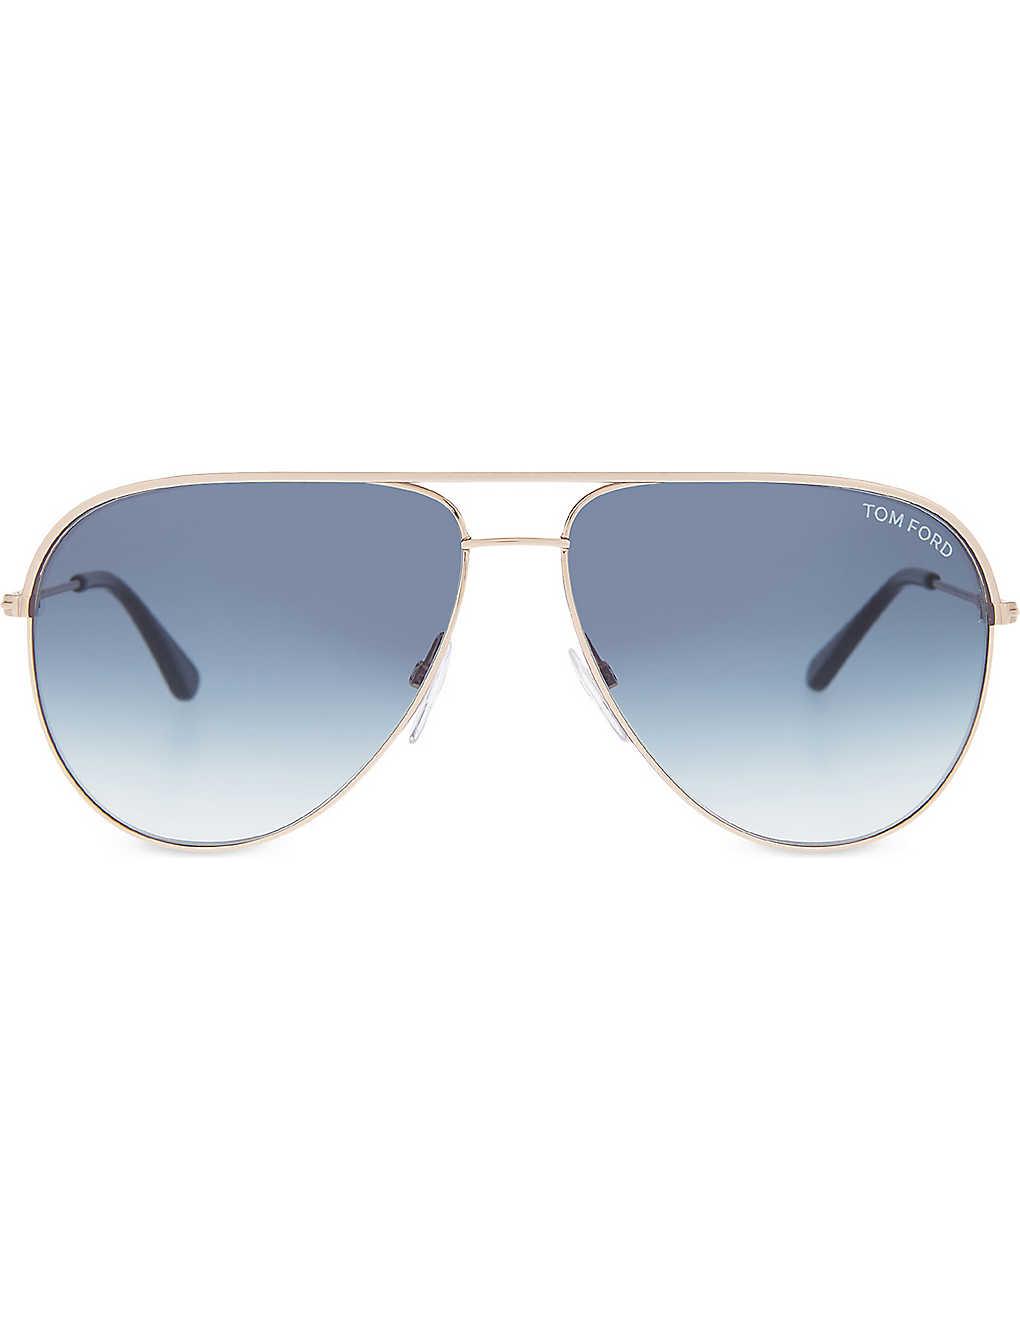 751c127fac302 TOM FORD - Erin TF466 aviator sunglasses